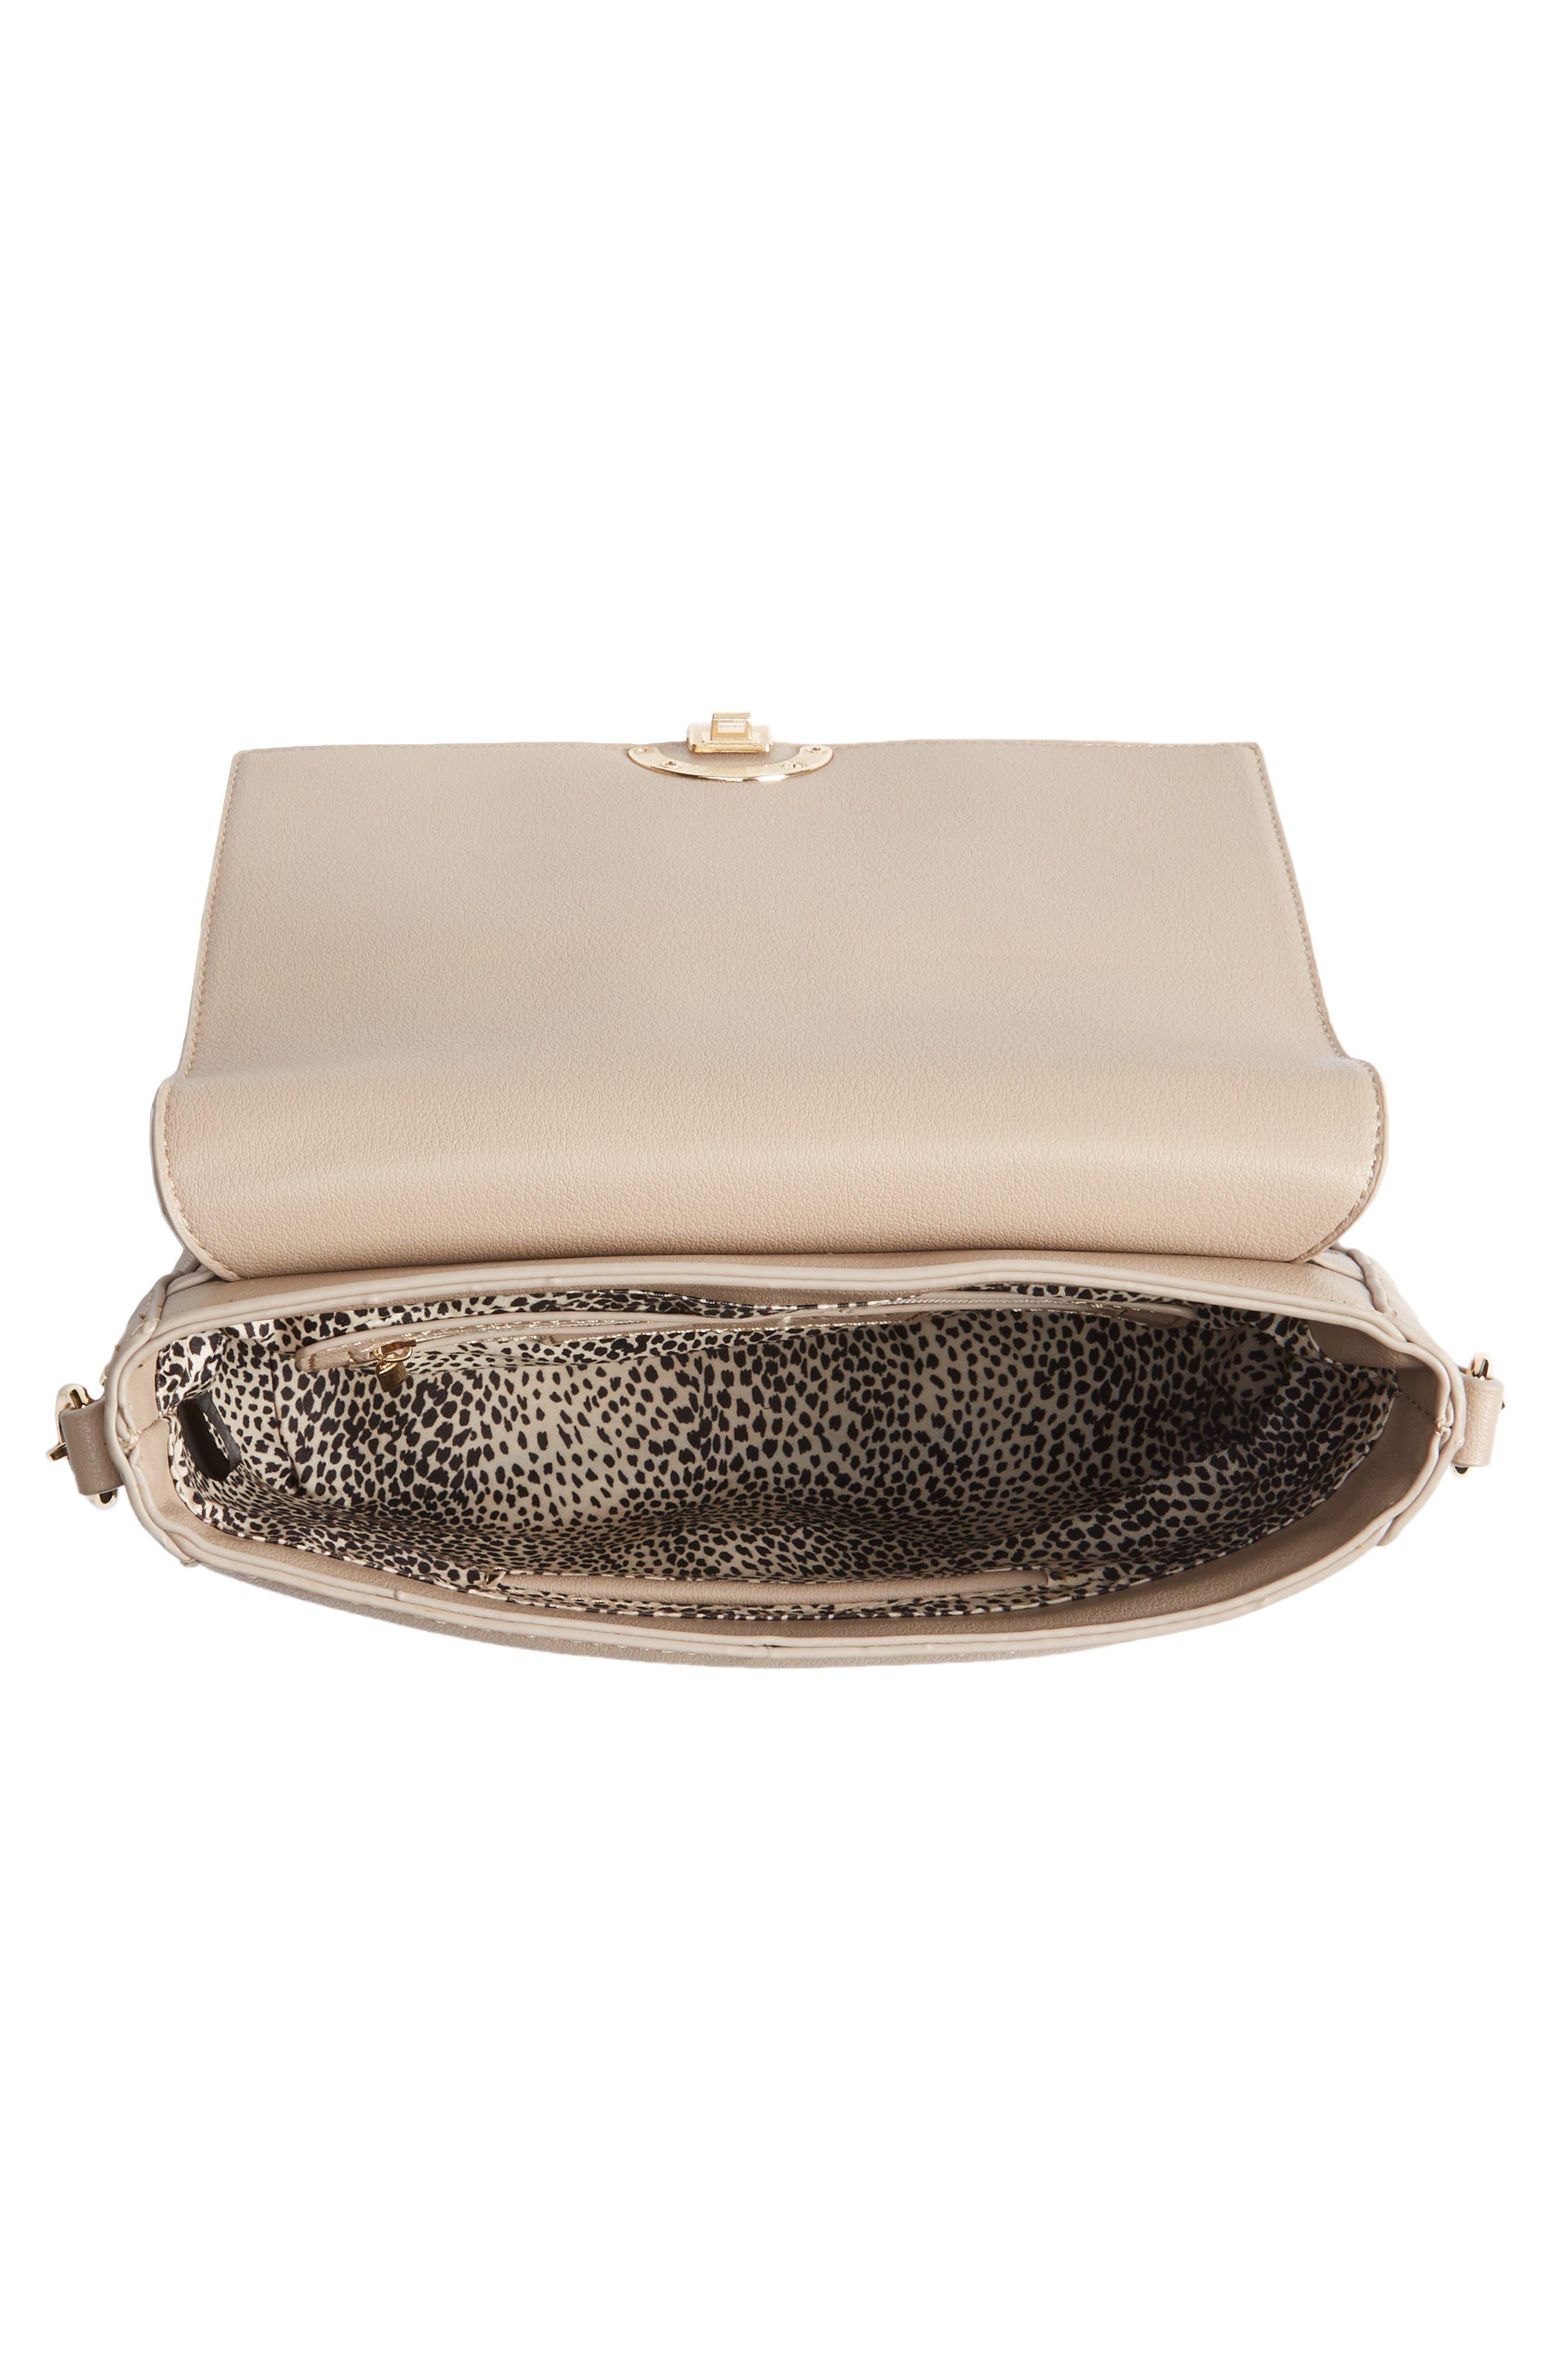 Colie Faux Leather Crossbody Bag,                             Alternate thumbnail 11, color,